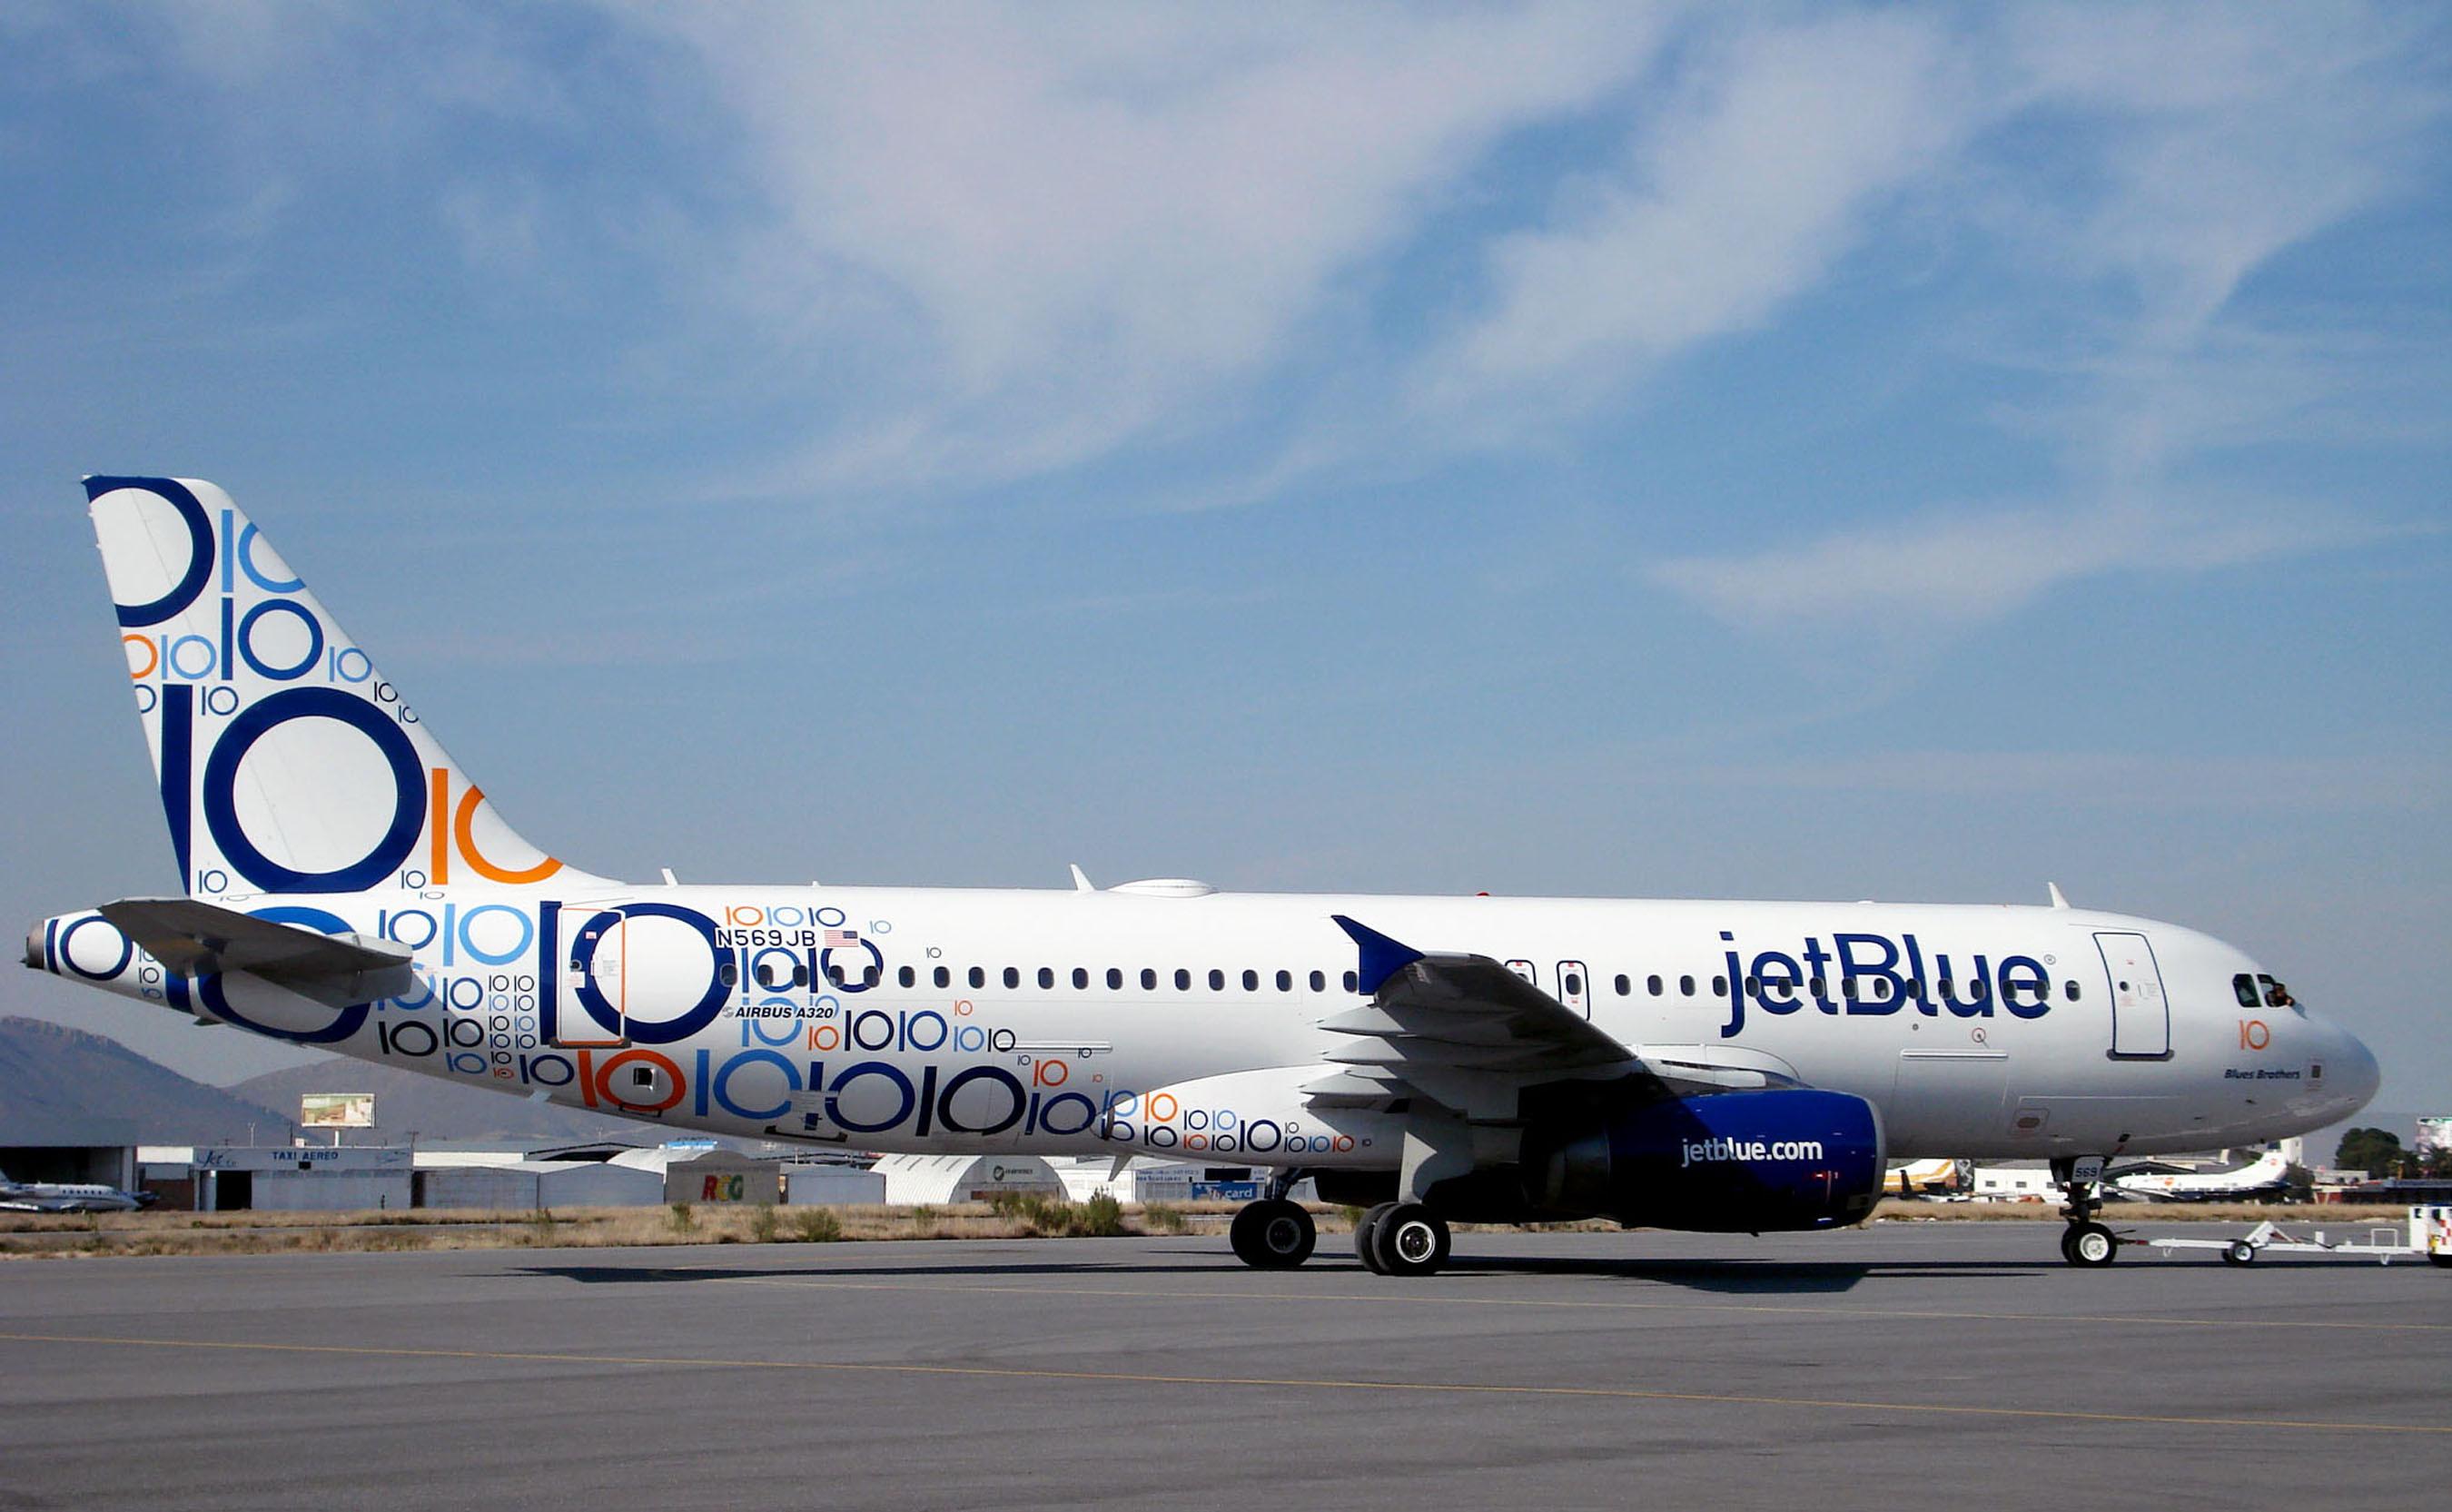 Photos Jetblue Unveils New 10th Anniversary Scheme